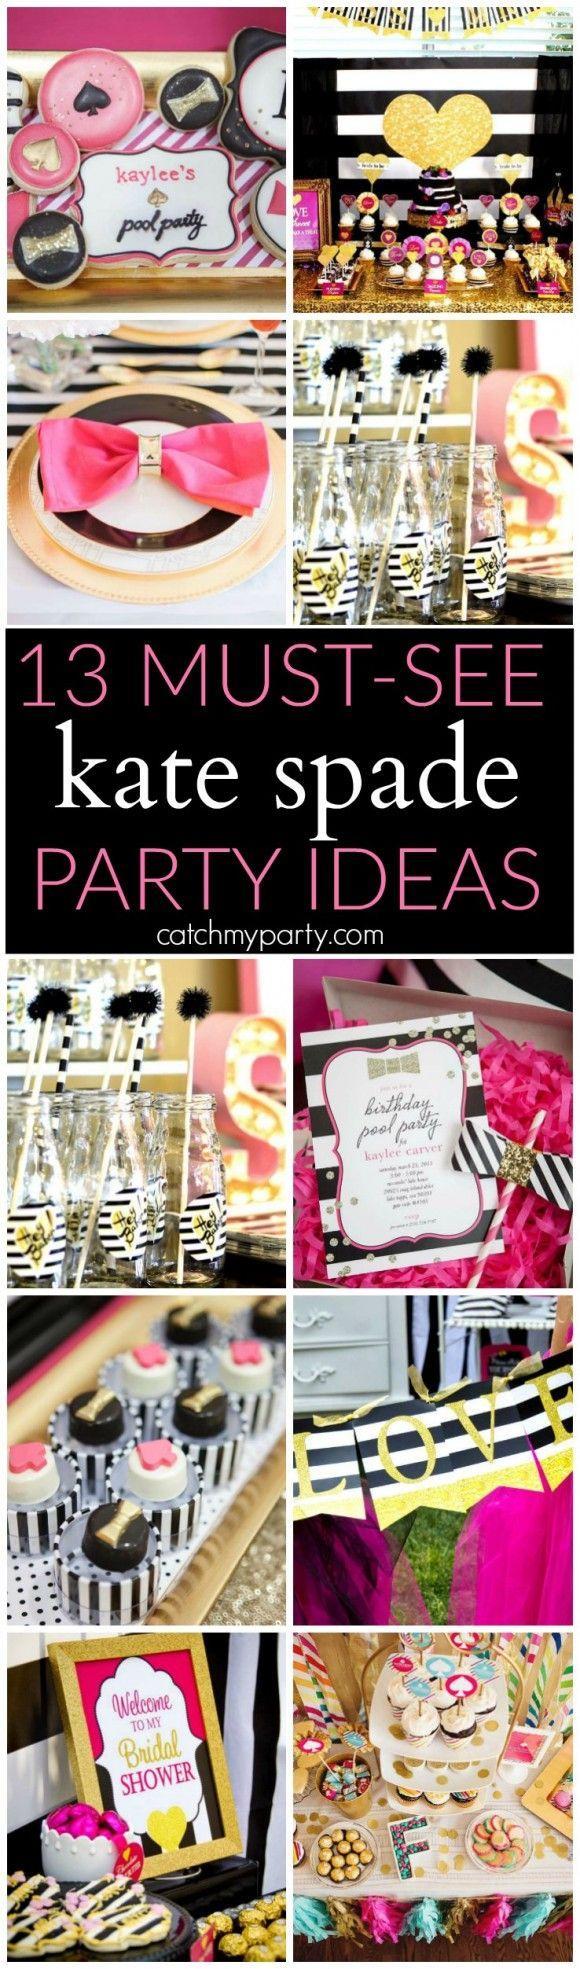 Wedding - 13 Awesome Kate Spade Party Ideas